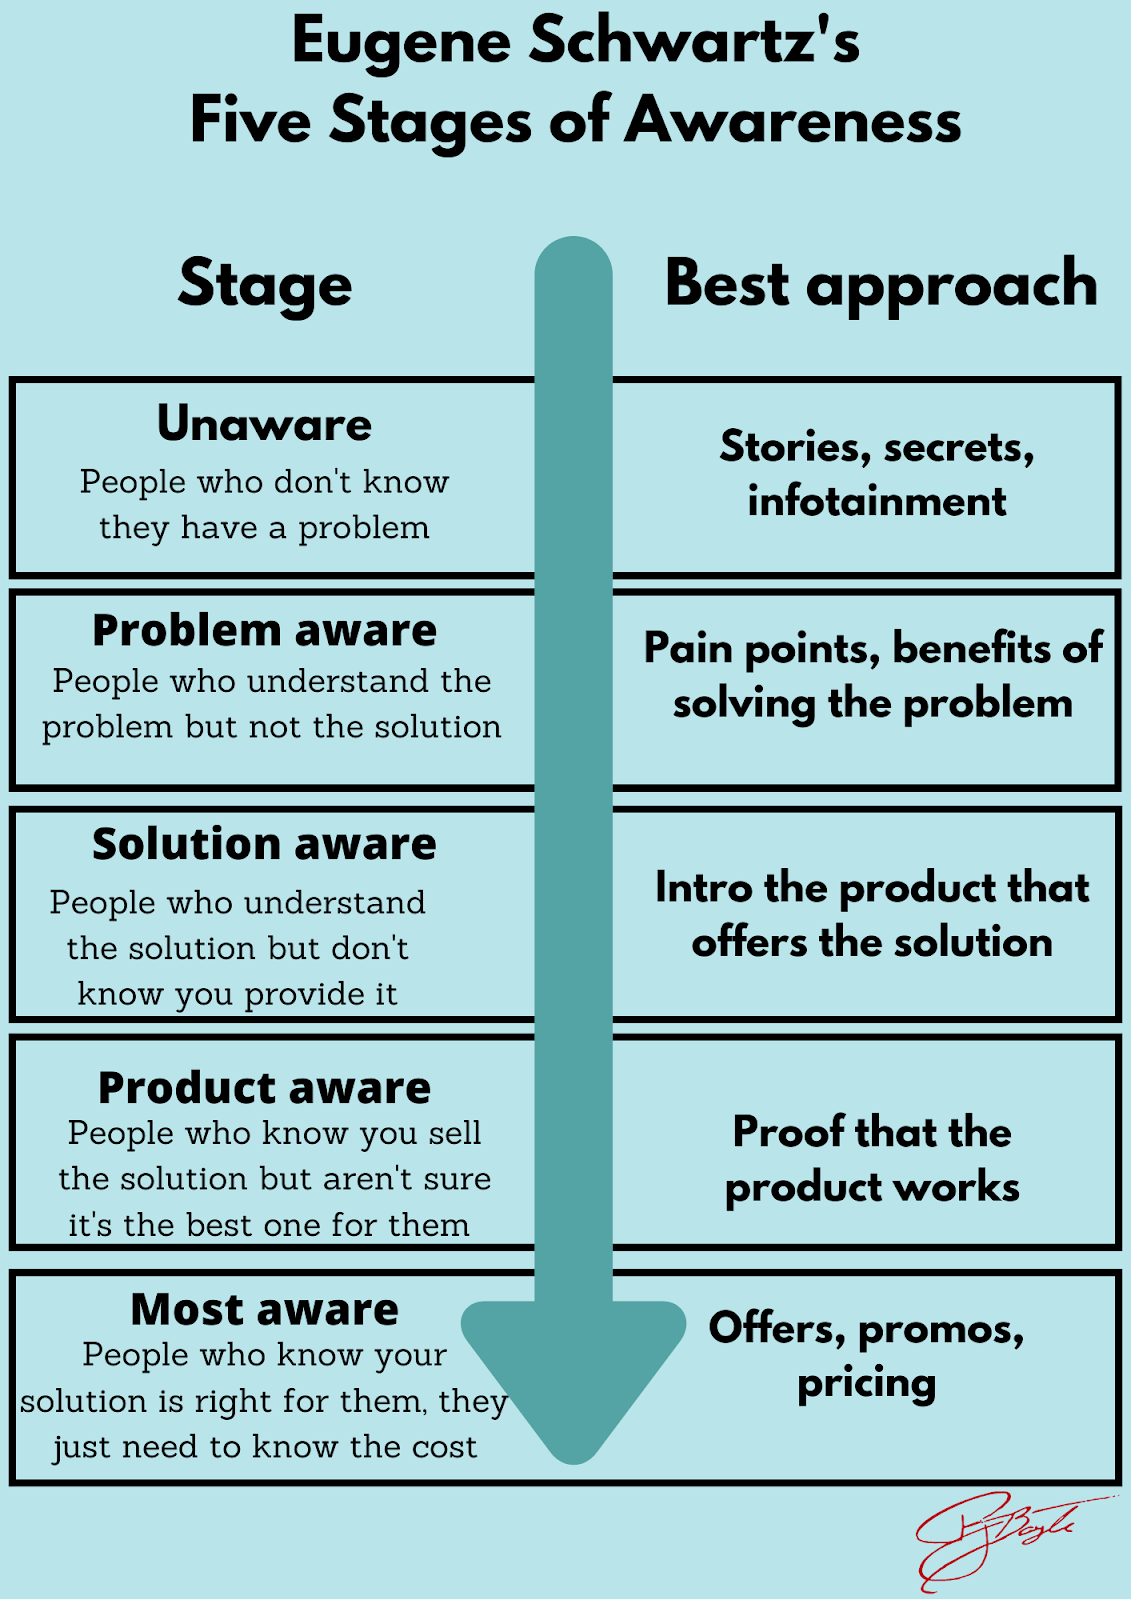 Eugene Schwartz stages of awareness